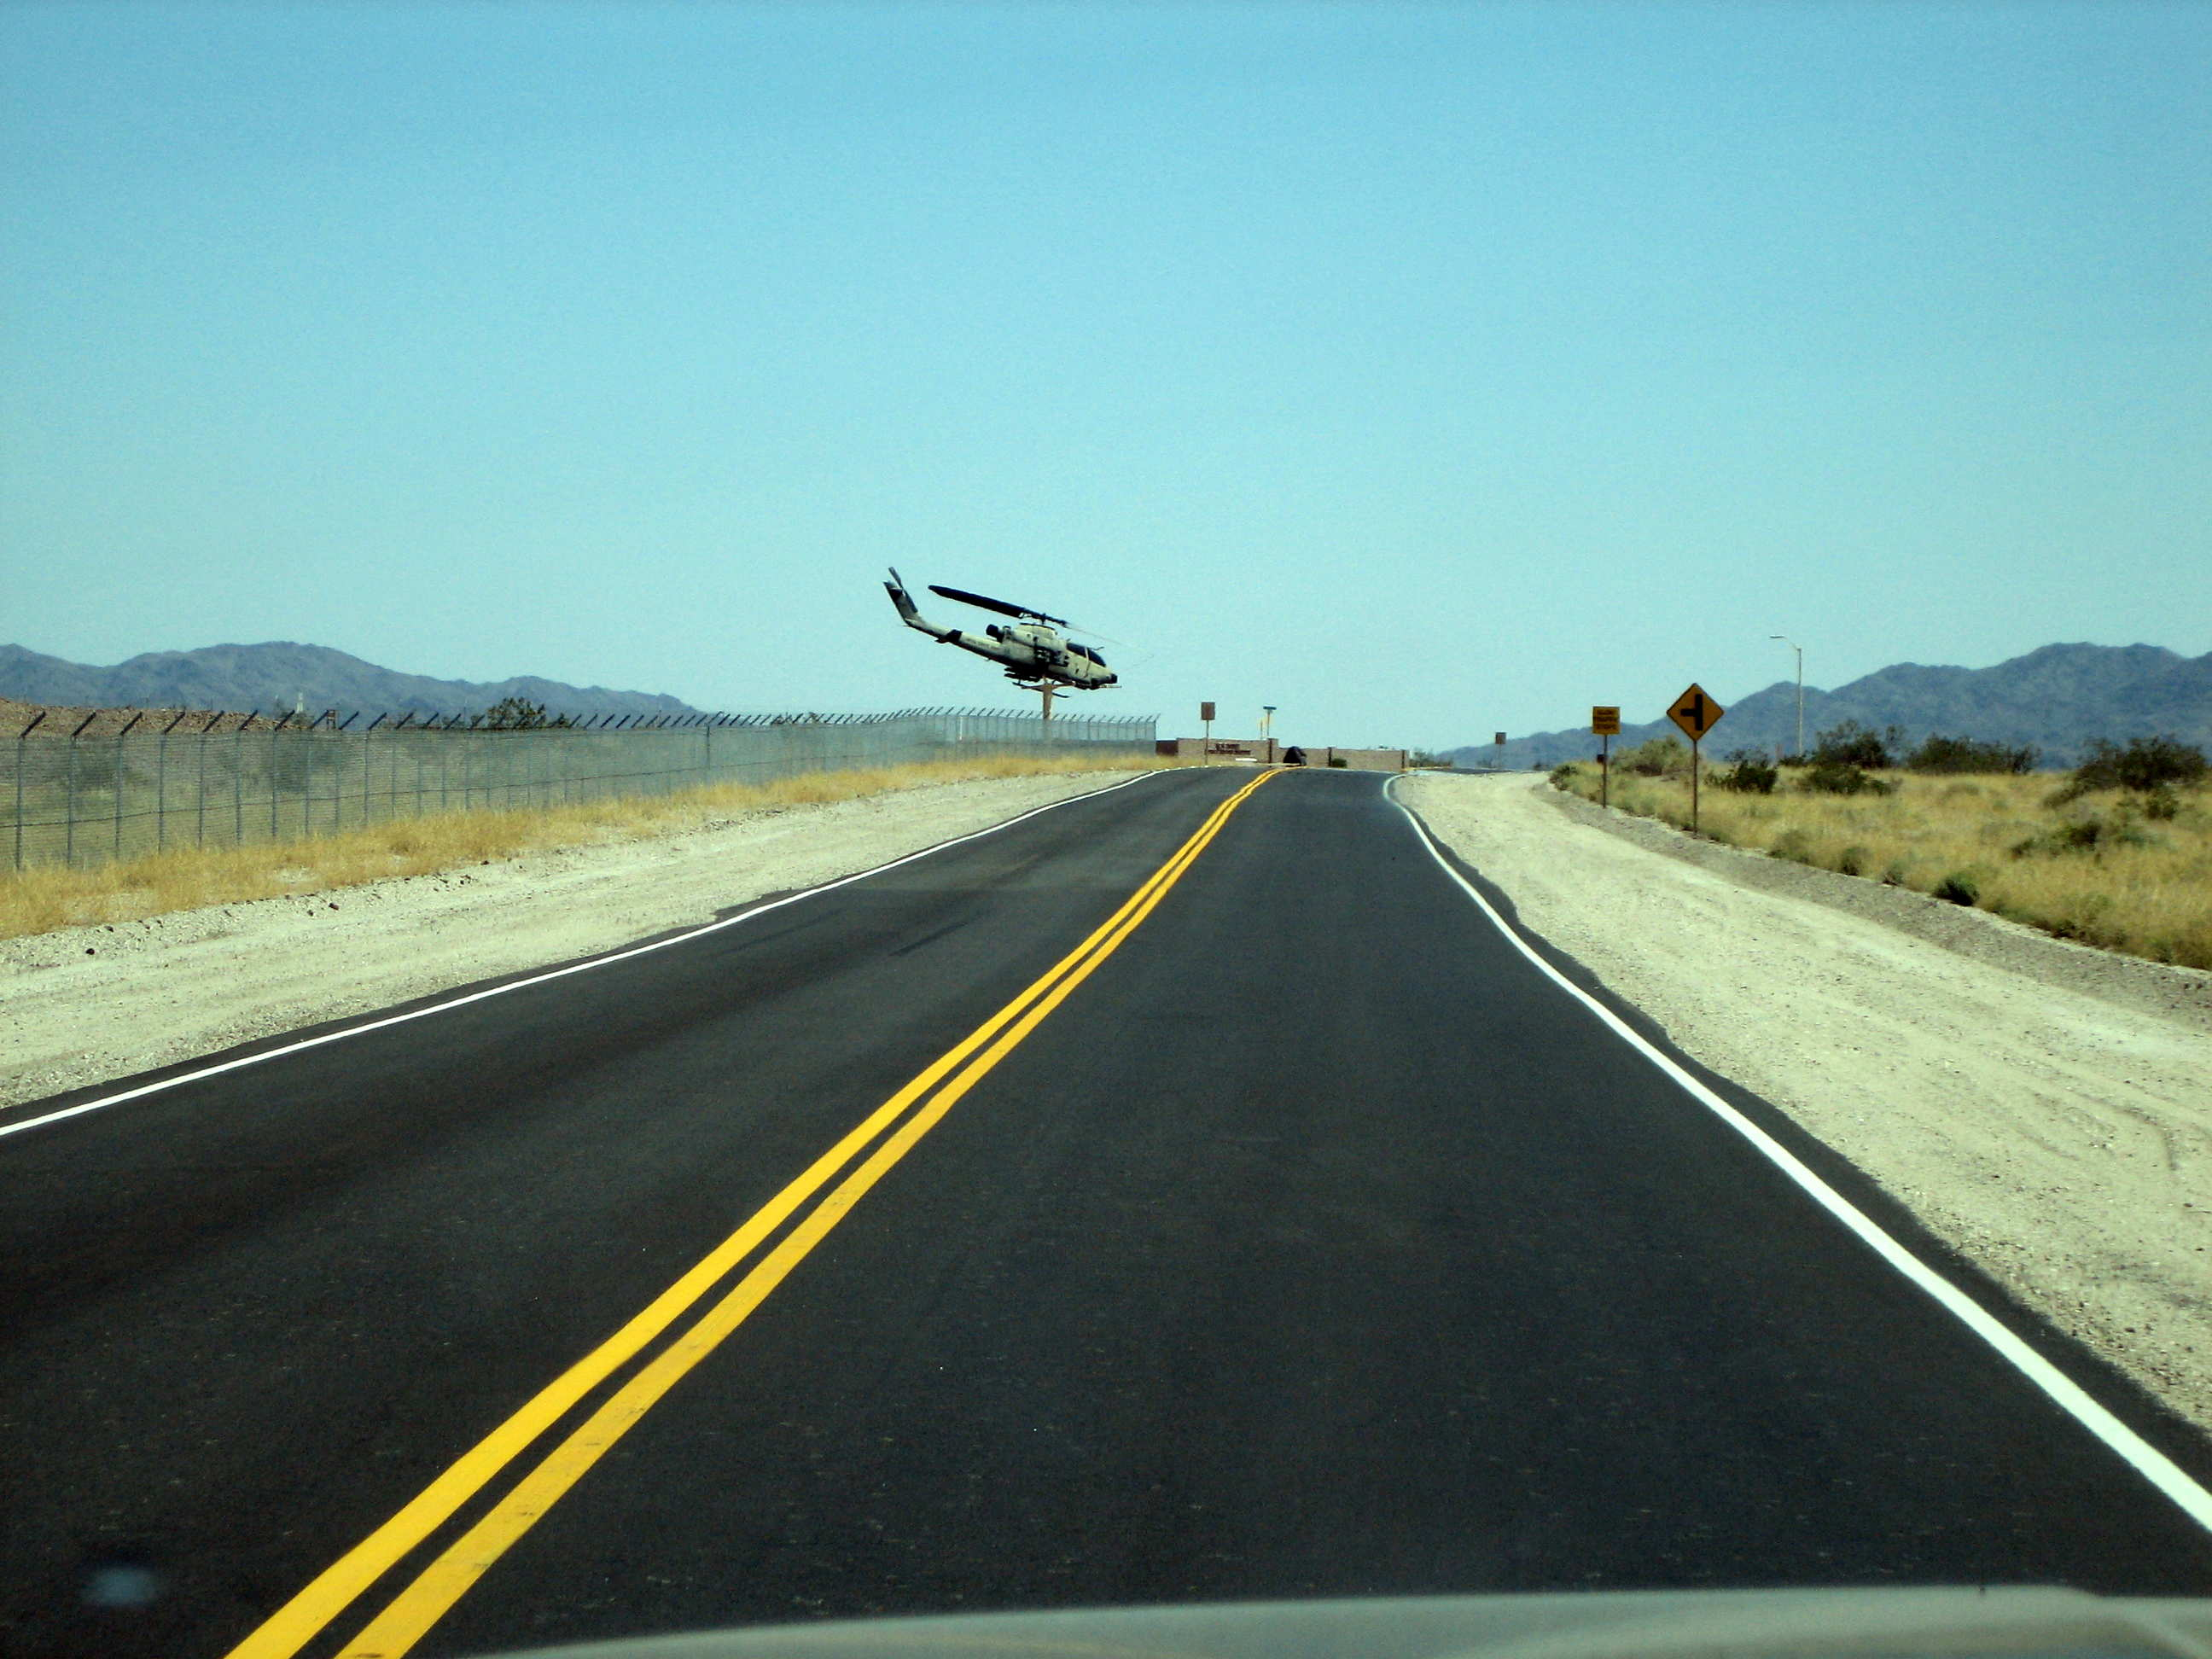 US Army Yuma Proving Ground Entrance on Left?